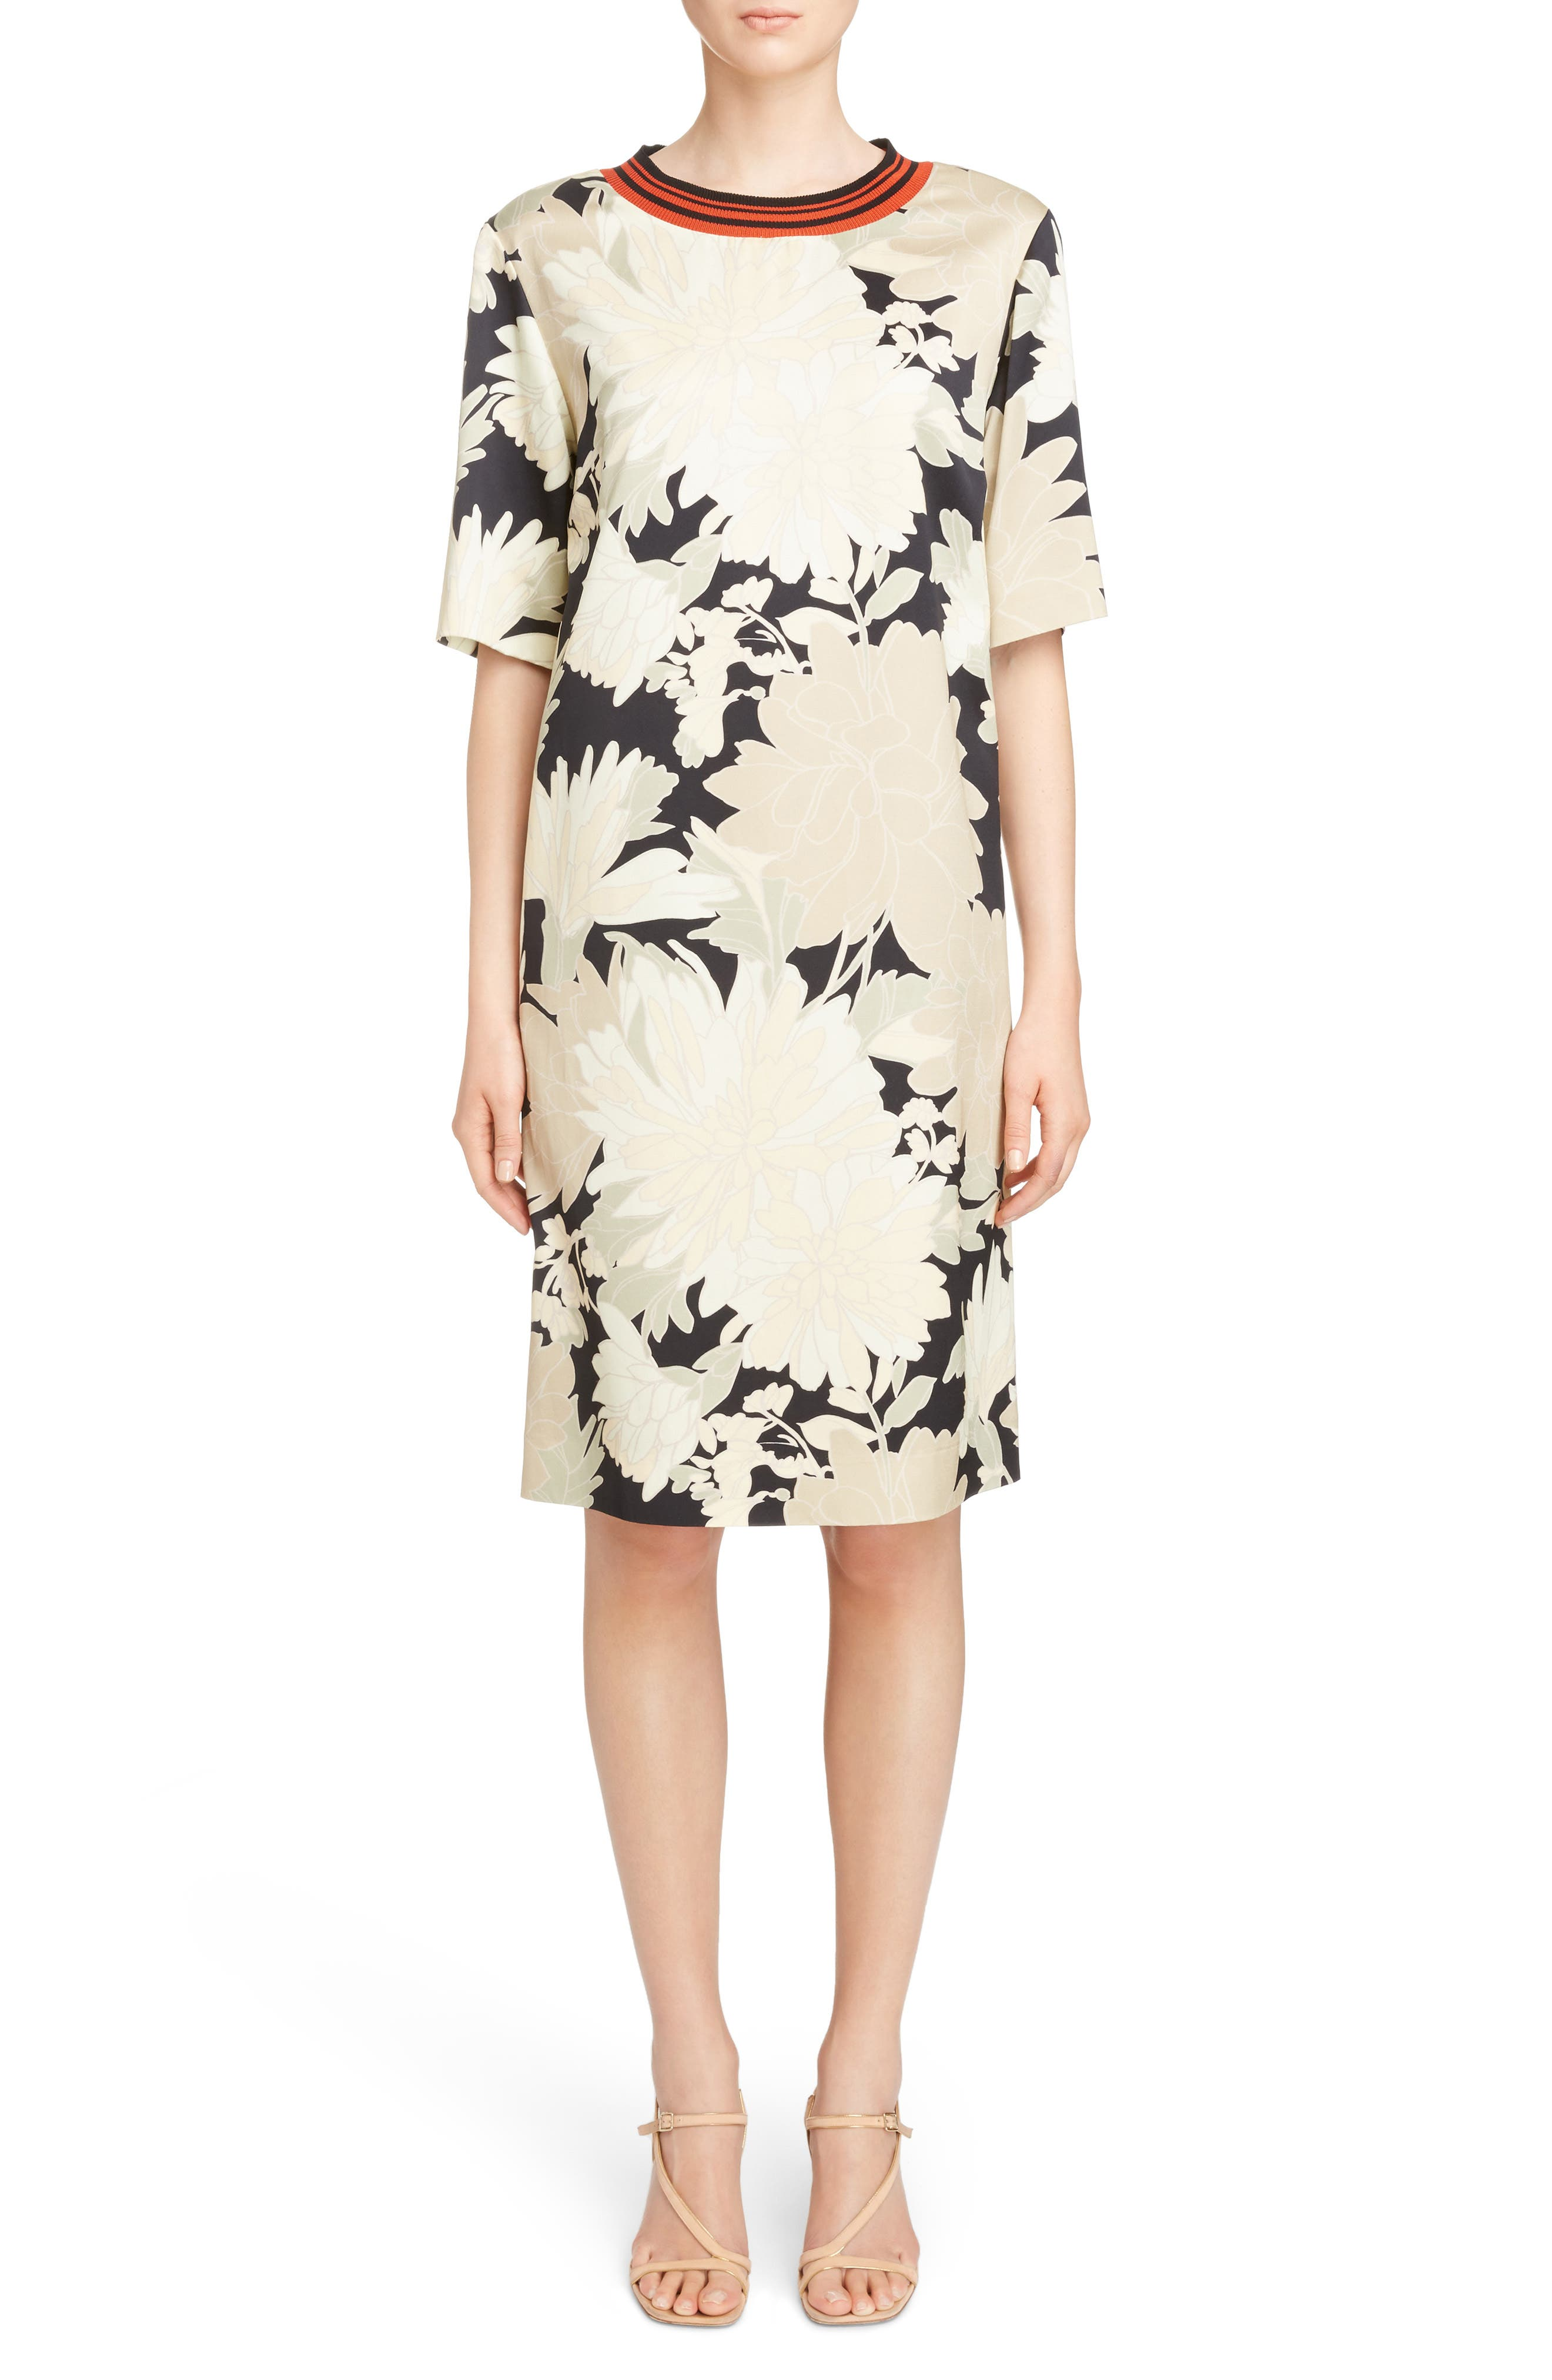 Alternate Image 1 Selected - Dries Van Noten Knit Trim Floral Dress